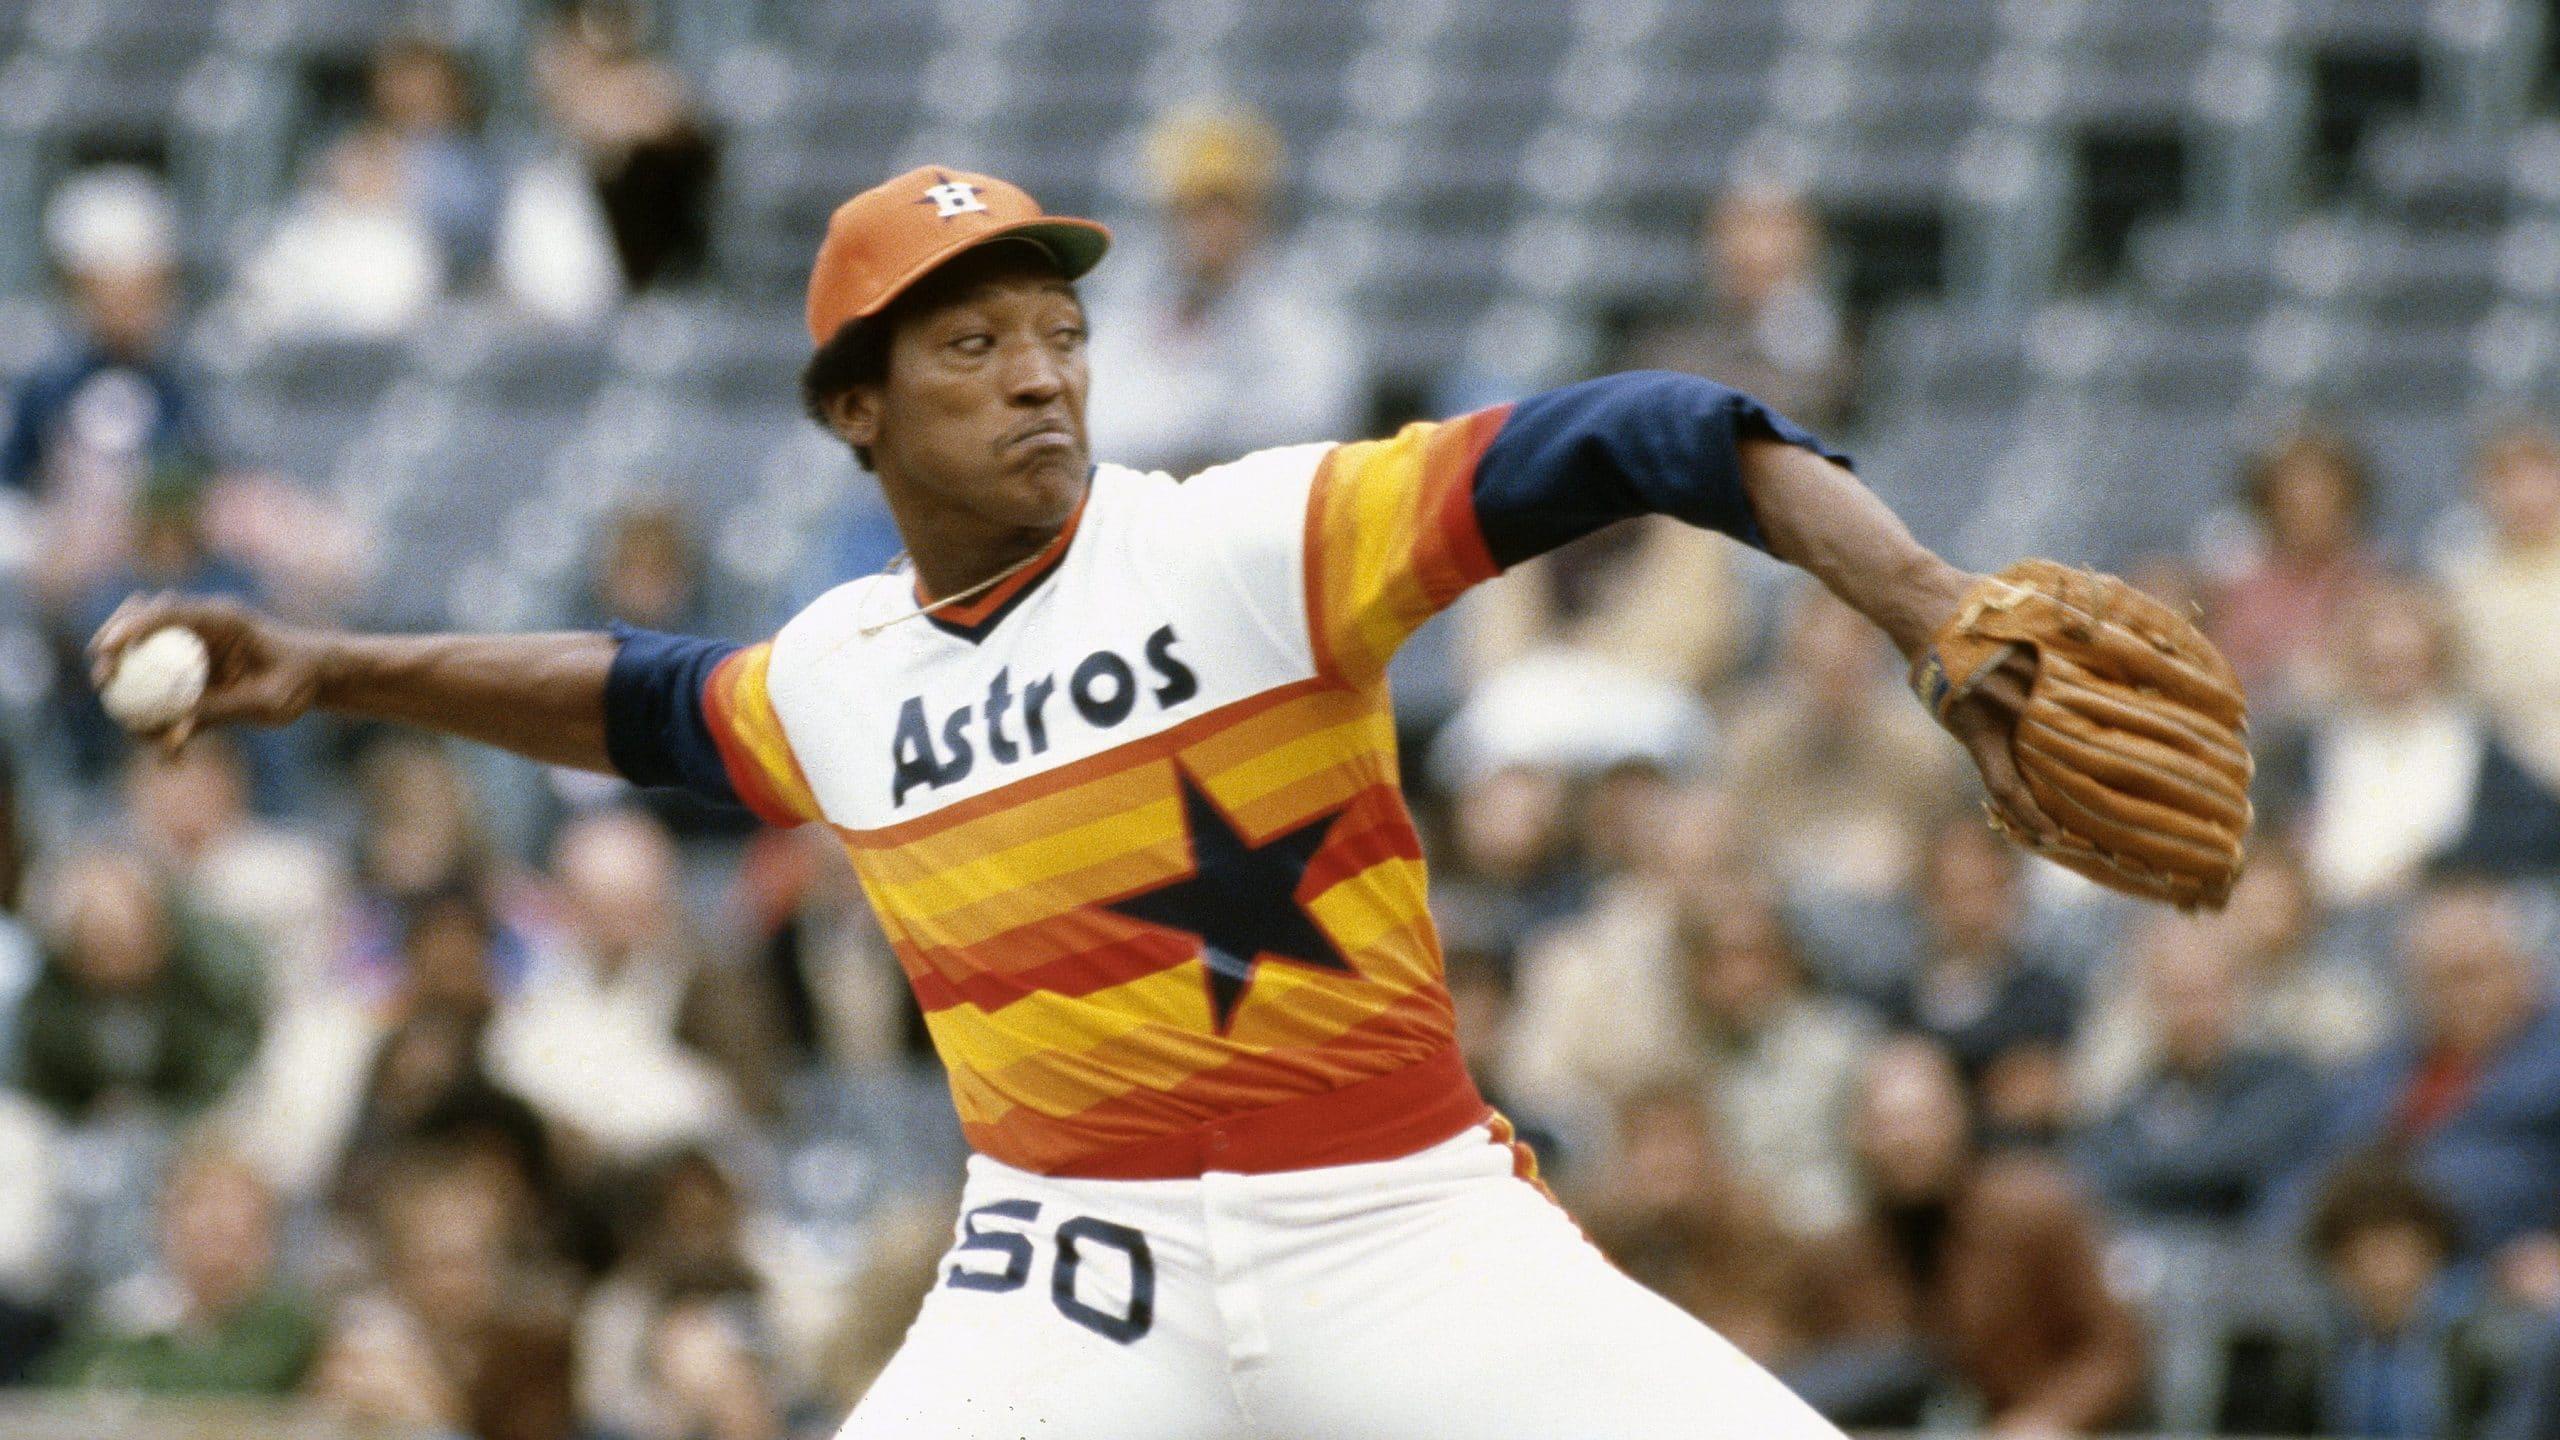 Historic Houston Astros pitcher JR Richard has died